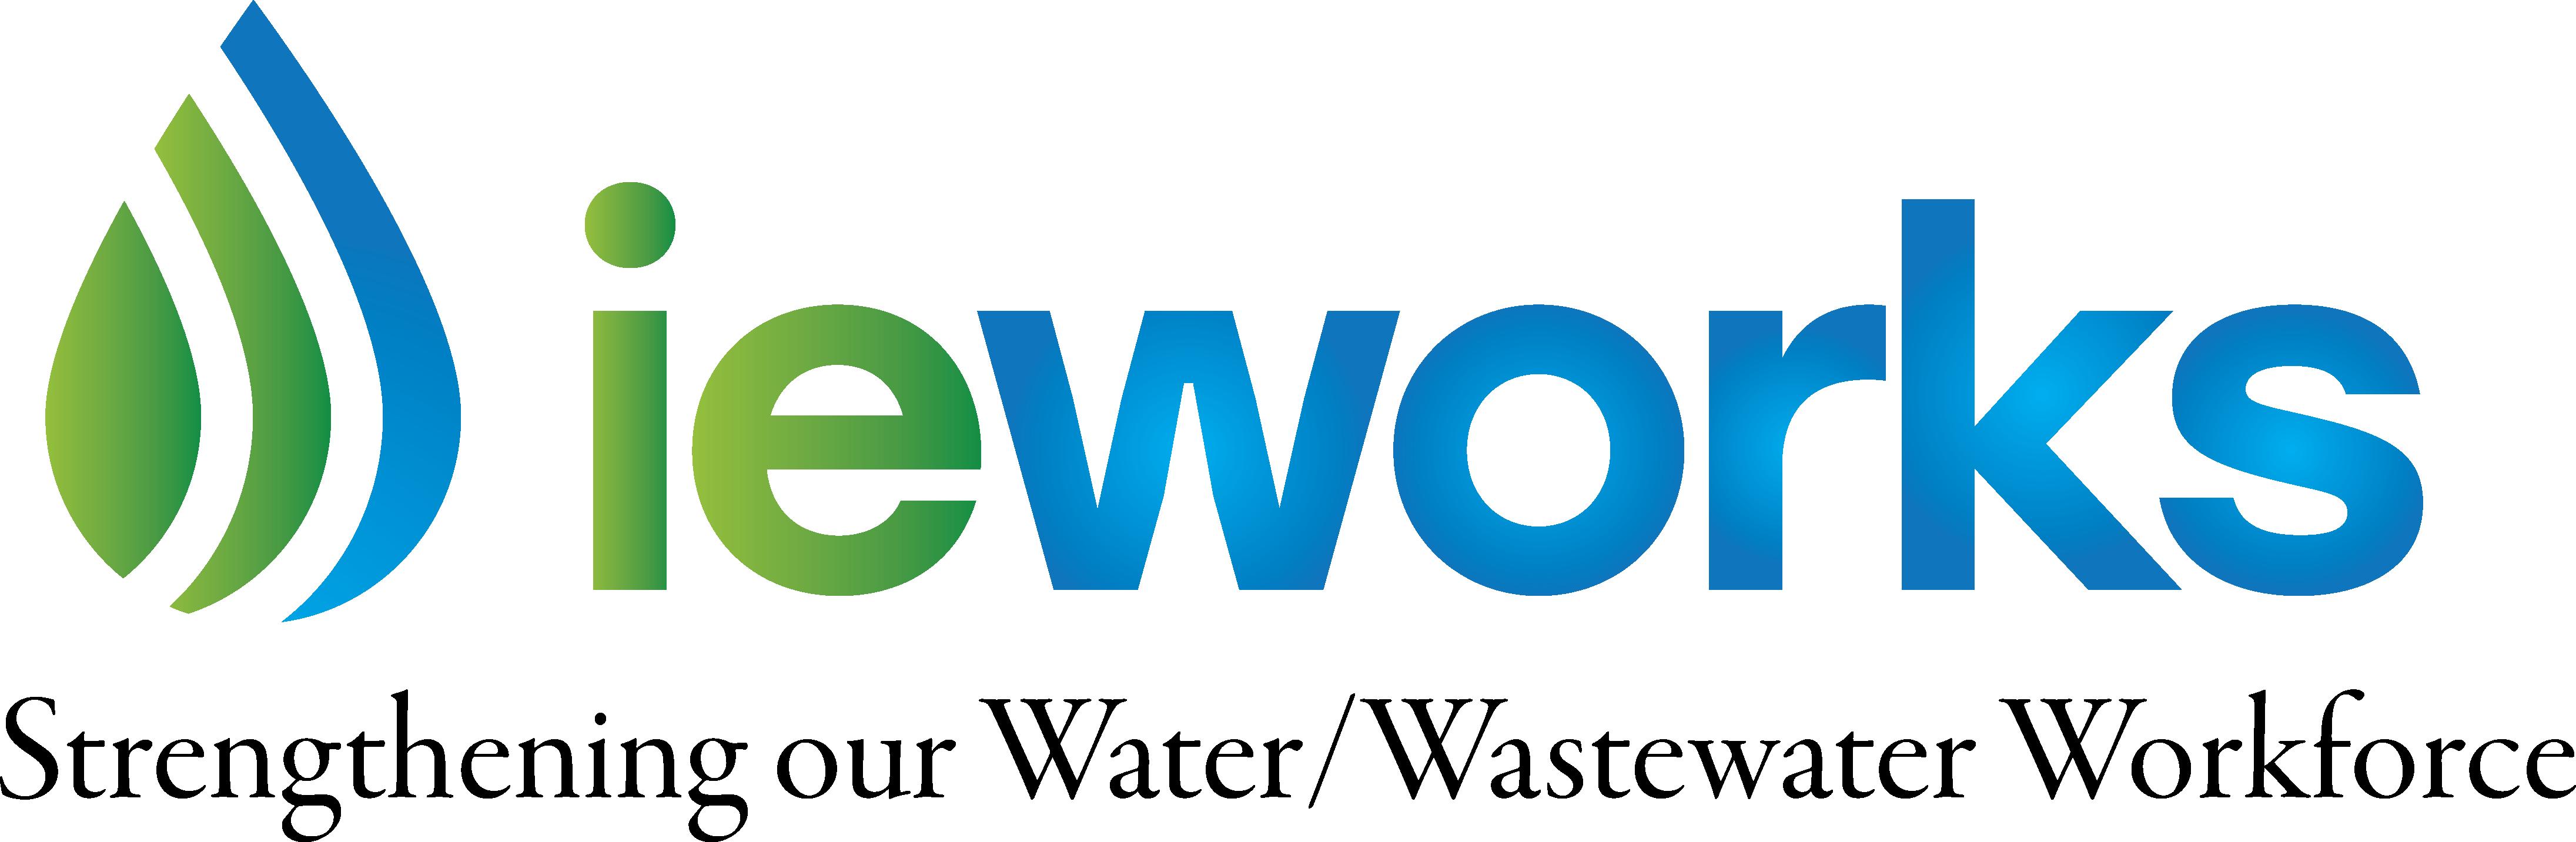 IEWorks